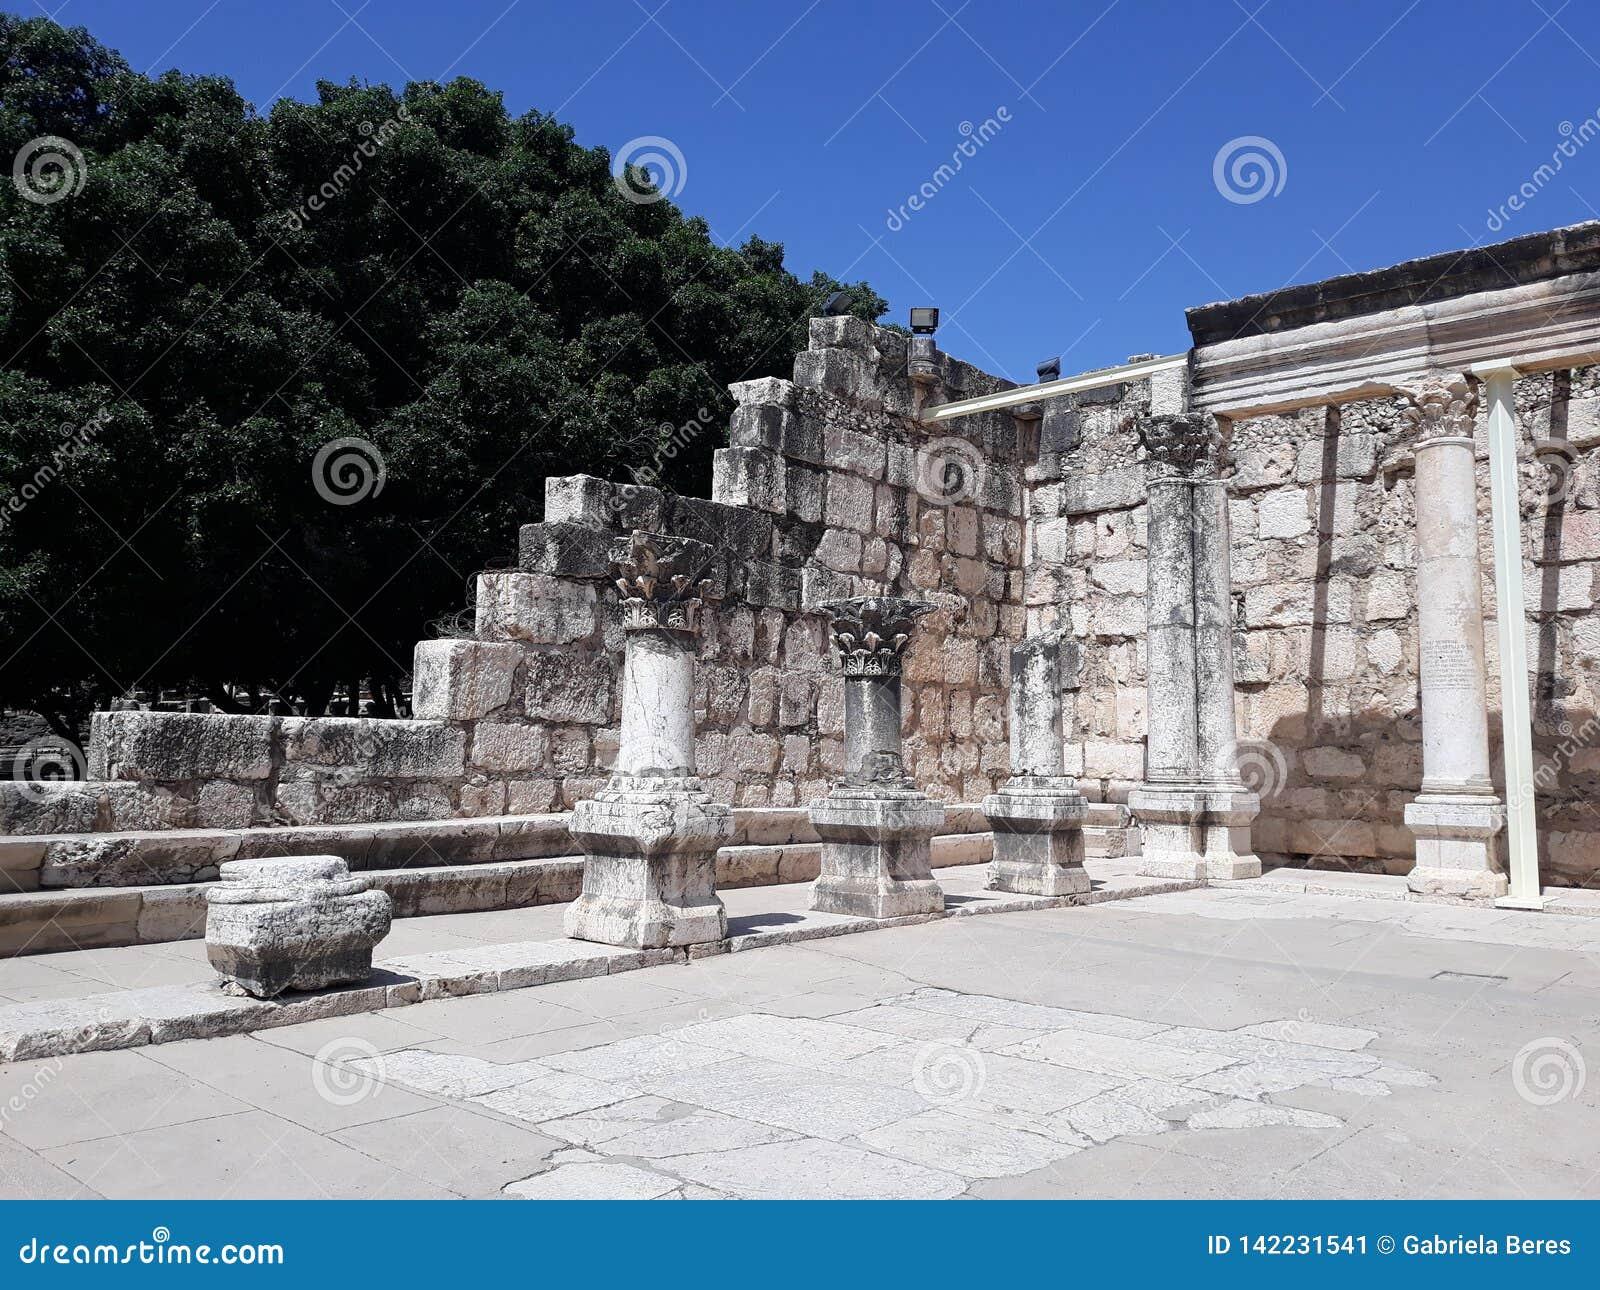 Ruiny antyczna synagoga w Capernaum, Izrael